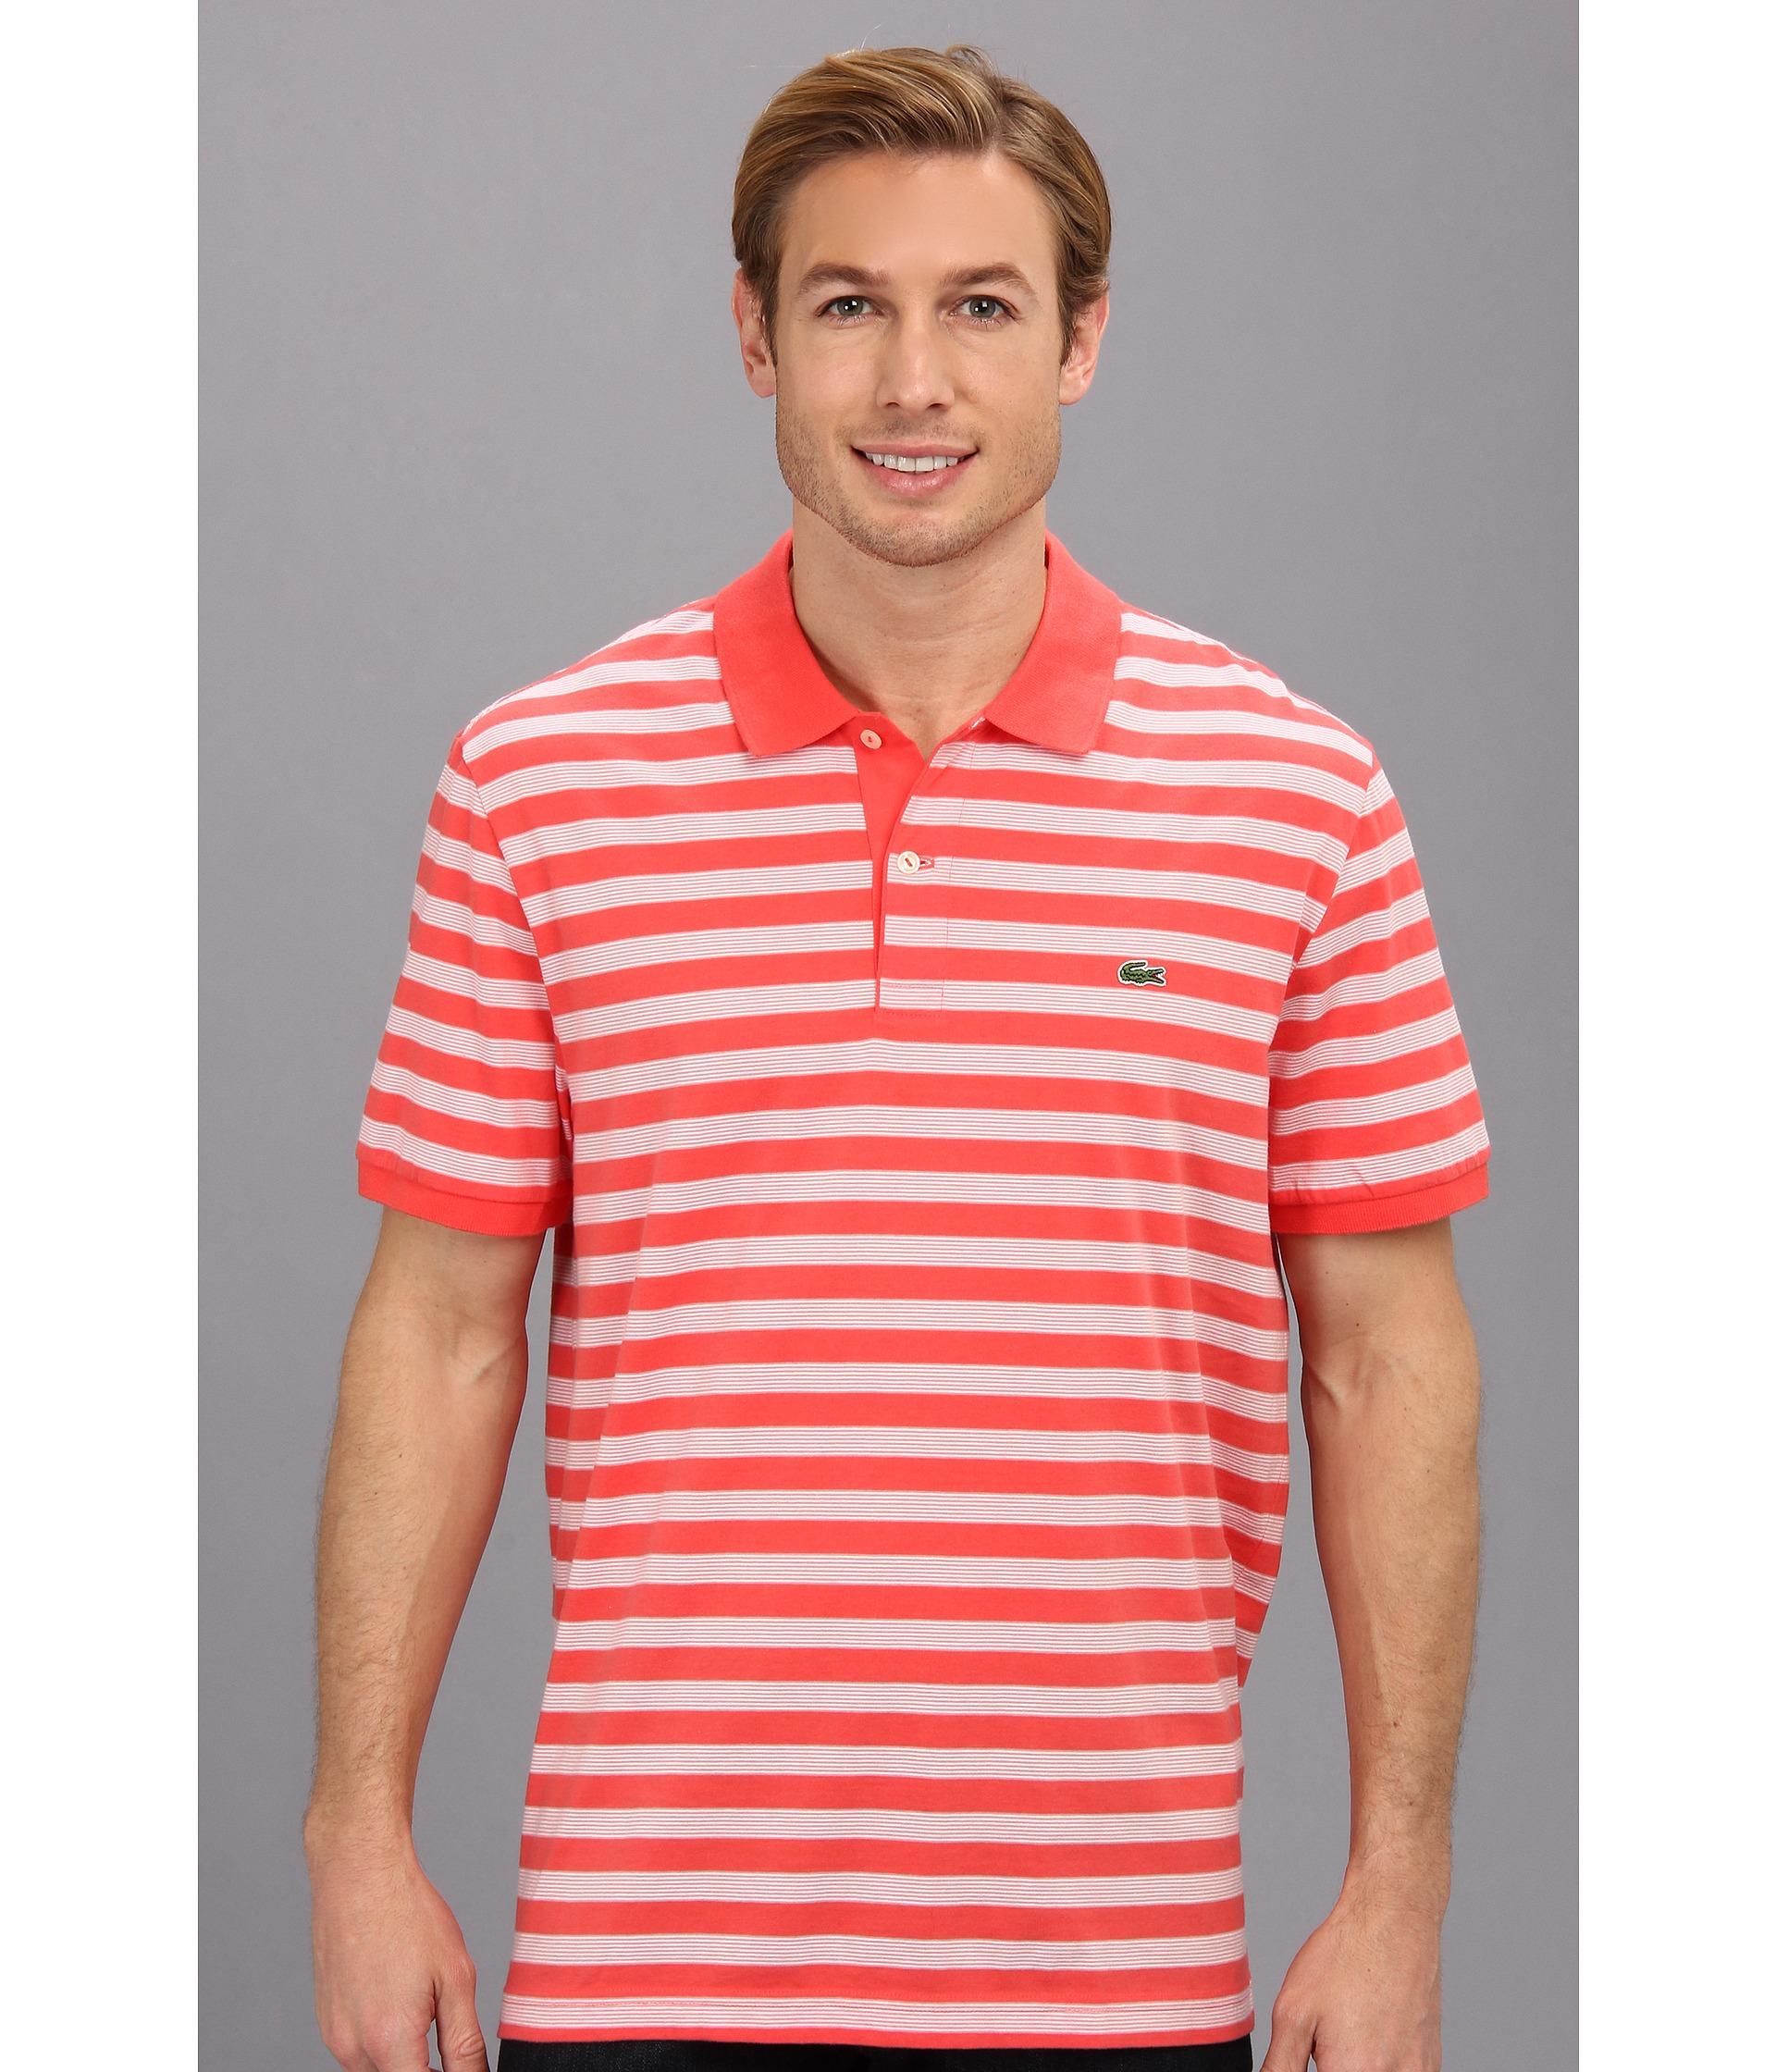 lacoste glc short sleeve jersey stripe polo shirt in pink